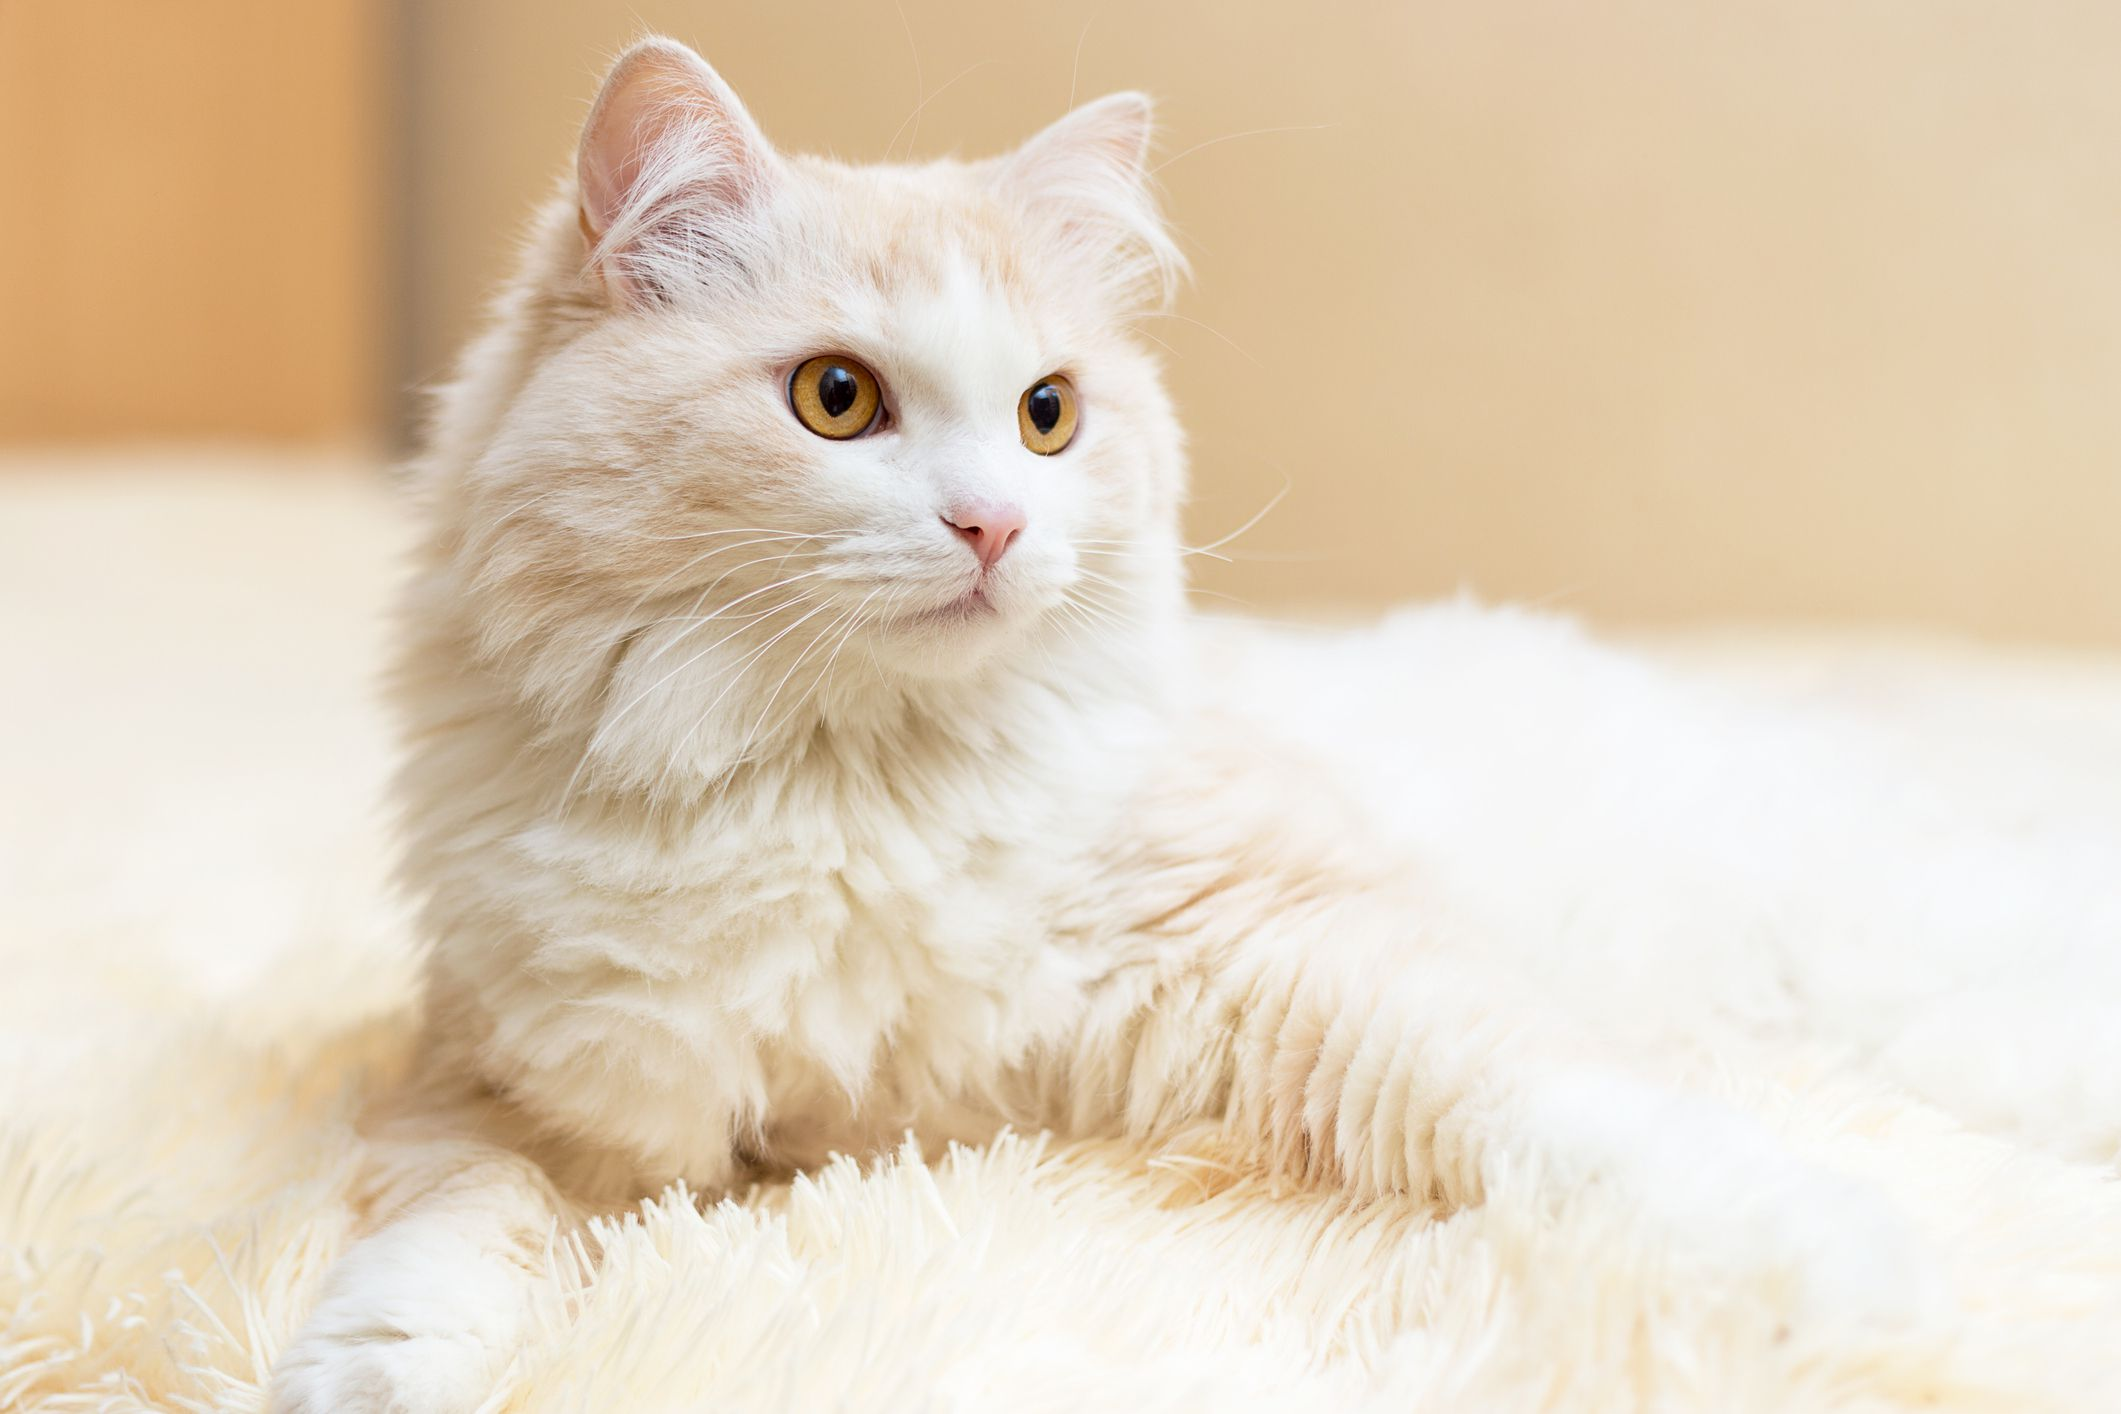 Turkish Angora Cats feature